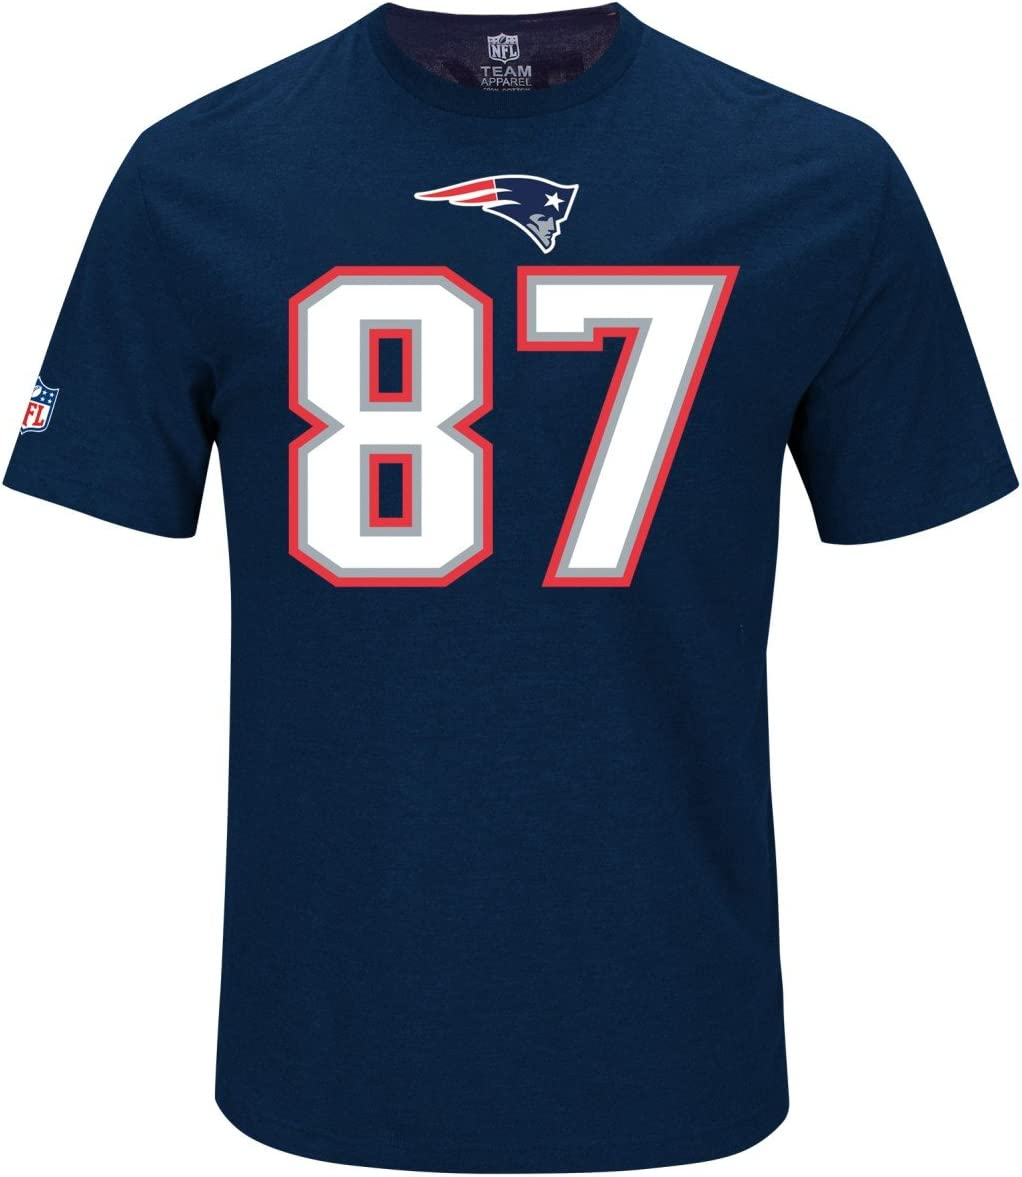 Majestic NFL Fan Shirt New England Patriots Rob Gronkowski